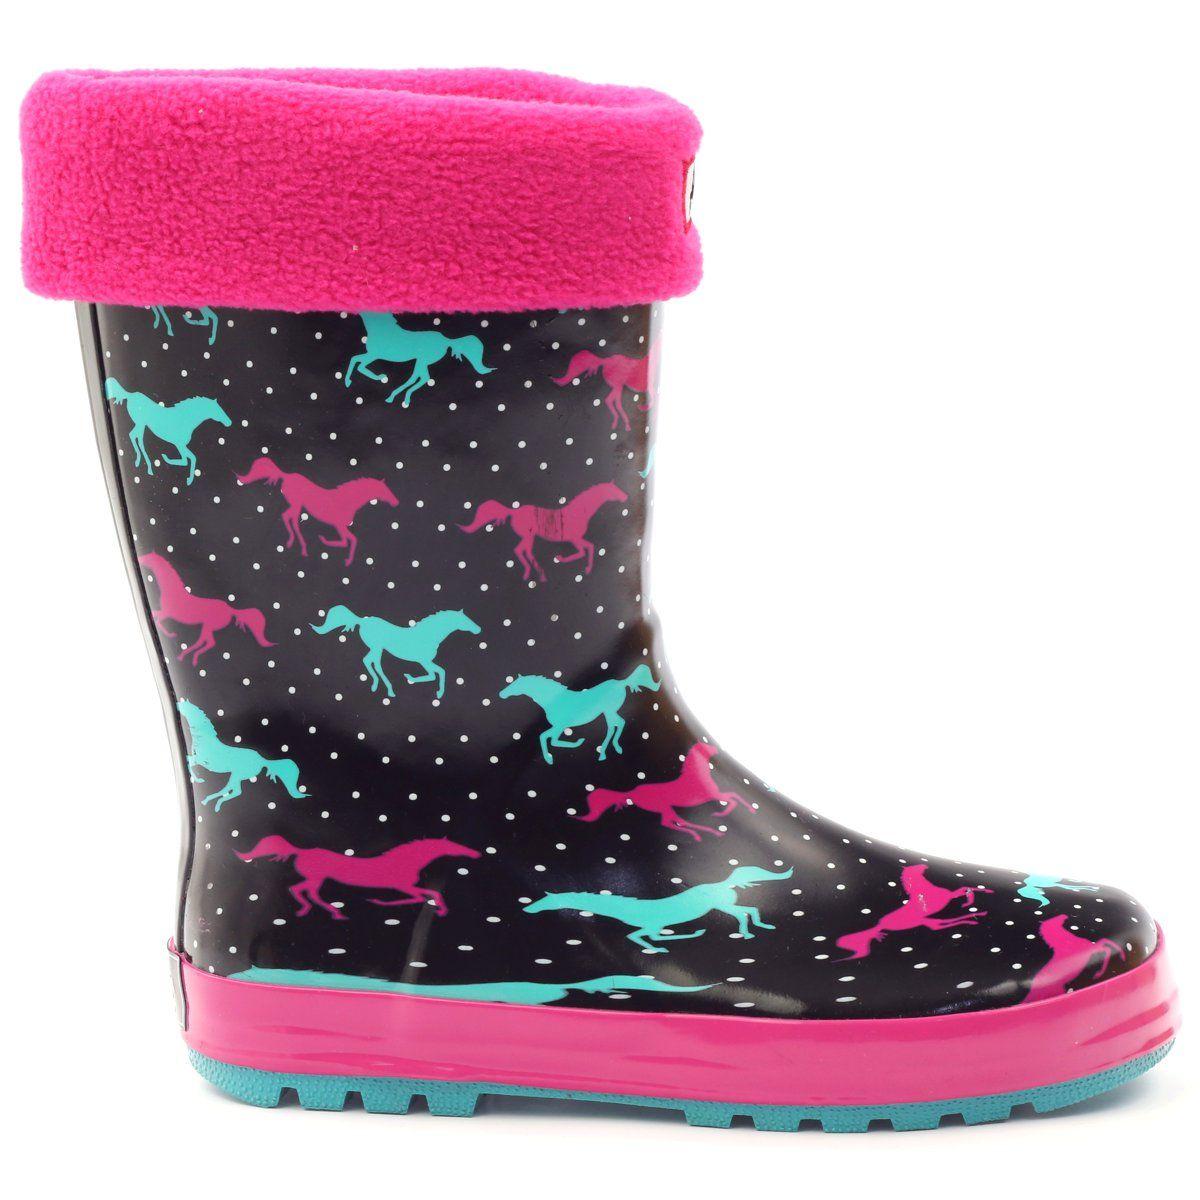 American Club Kalosze Skarpeta Wkladka American Konie Czarne Zielone Rozowe Rain Boots Boots Rubber Rain Boots